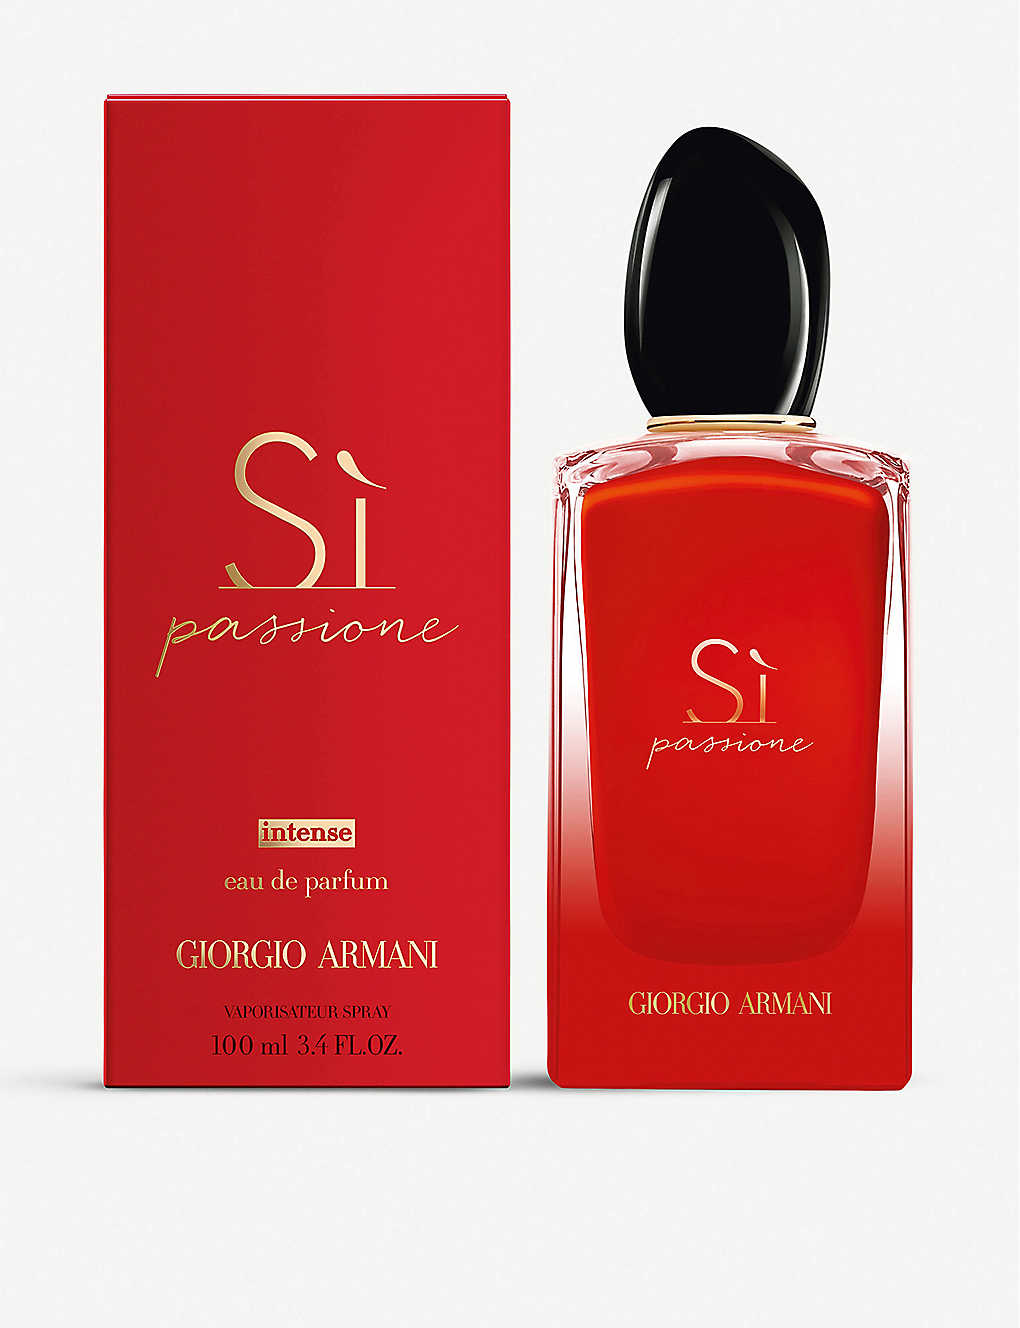 GIORGIO ARMANI: Sì Passione Intense Eau de Parfum